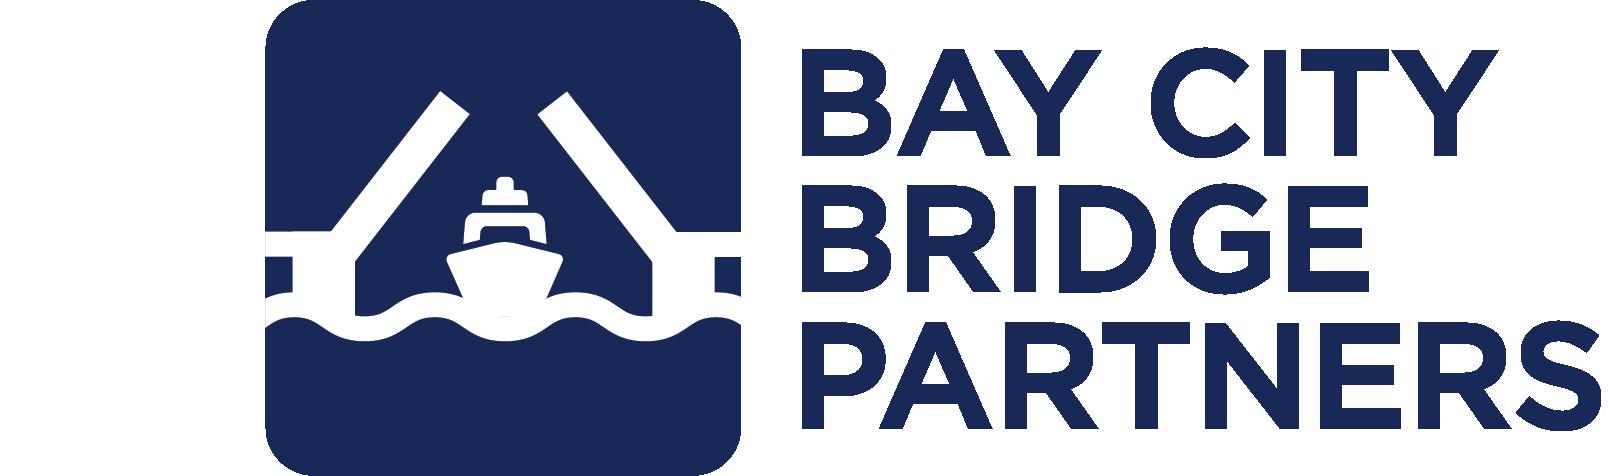 Bay-City-Bridge-Partners-Horizontal.png